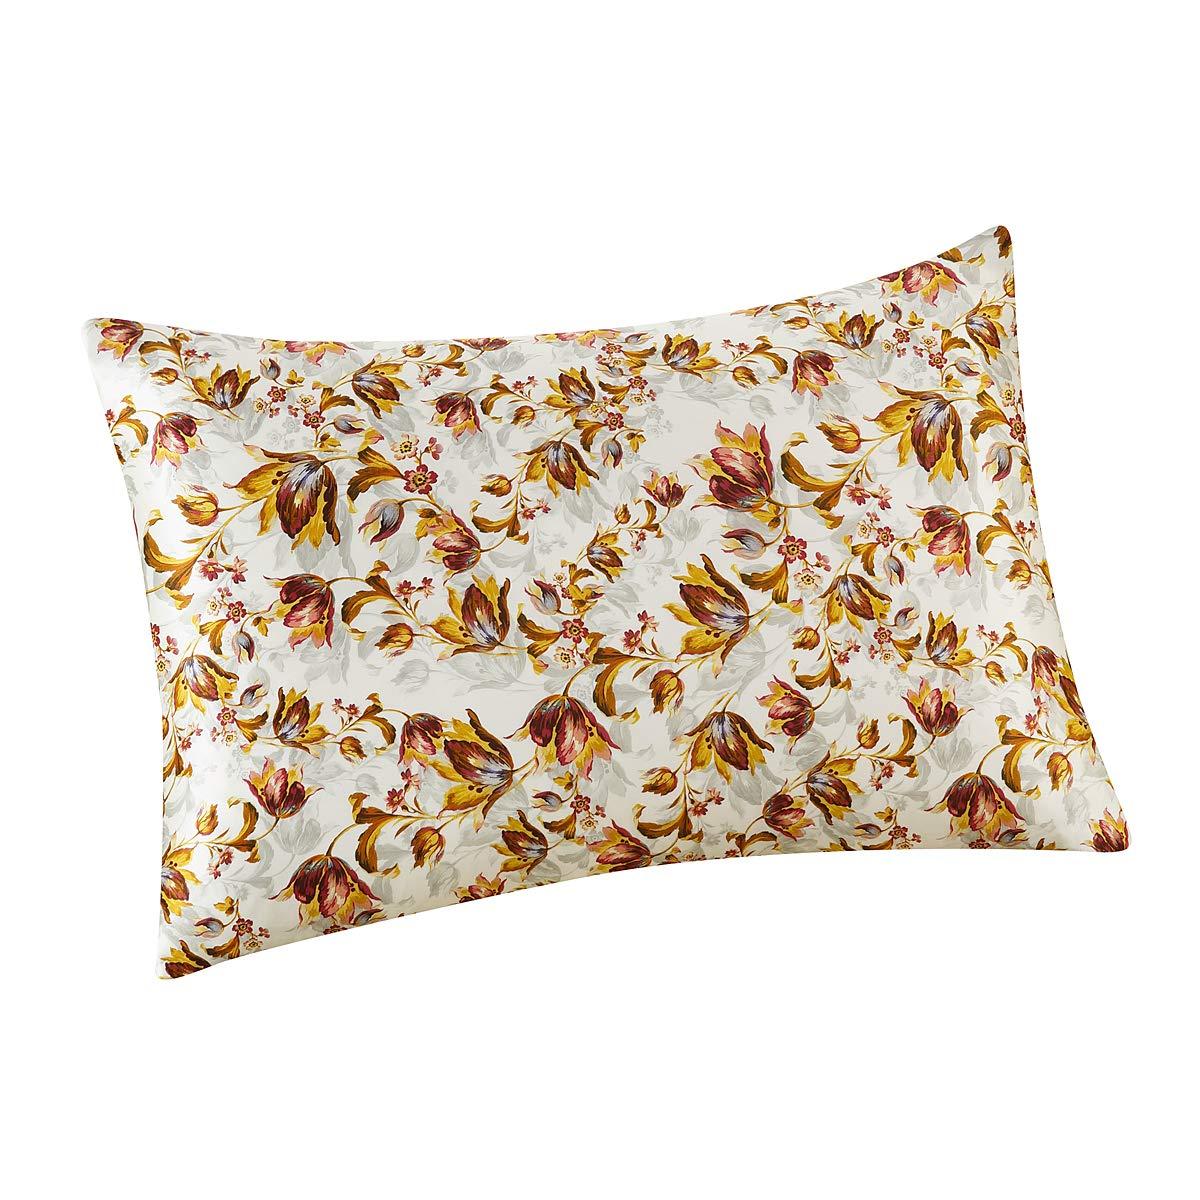 ALASKA BEAR - Natural Silk Pillowcase, Hypoallergenic, 19 Momme, 600 Thread Count 100% Mulberry Silk, King Size with Hidden Zipper, Custom Painting Pillow Case(1, Flowers(Ivory Grounding))